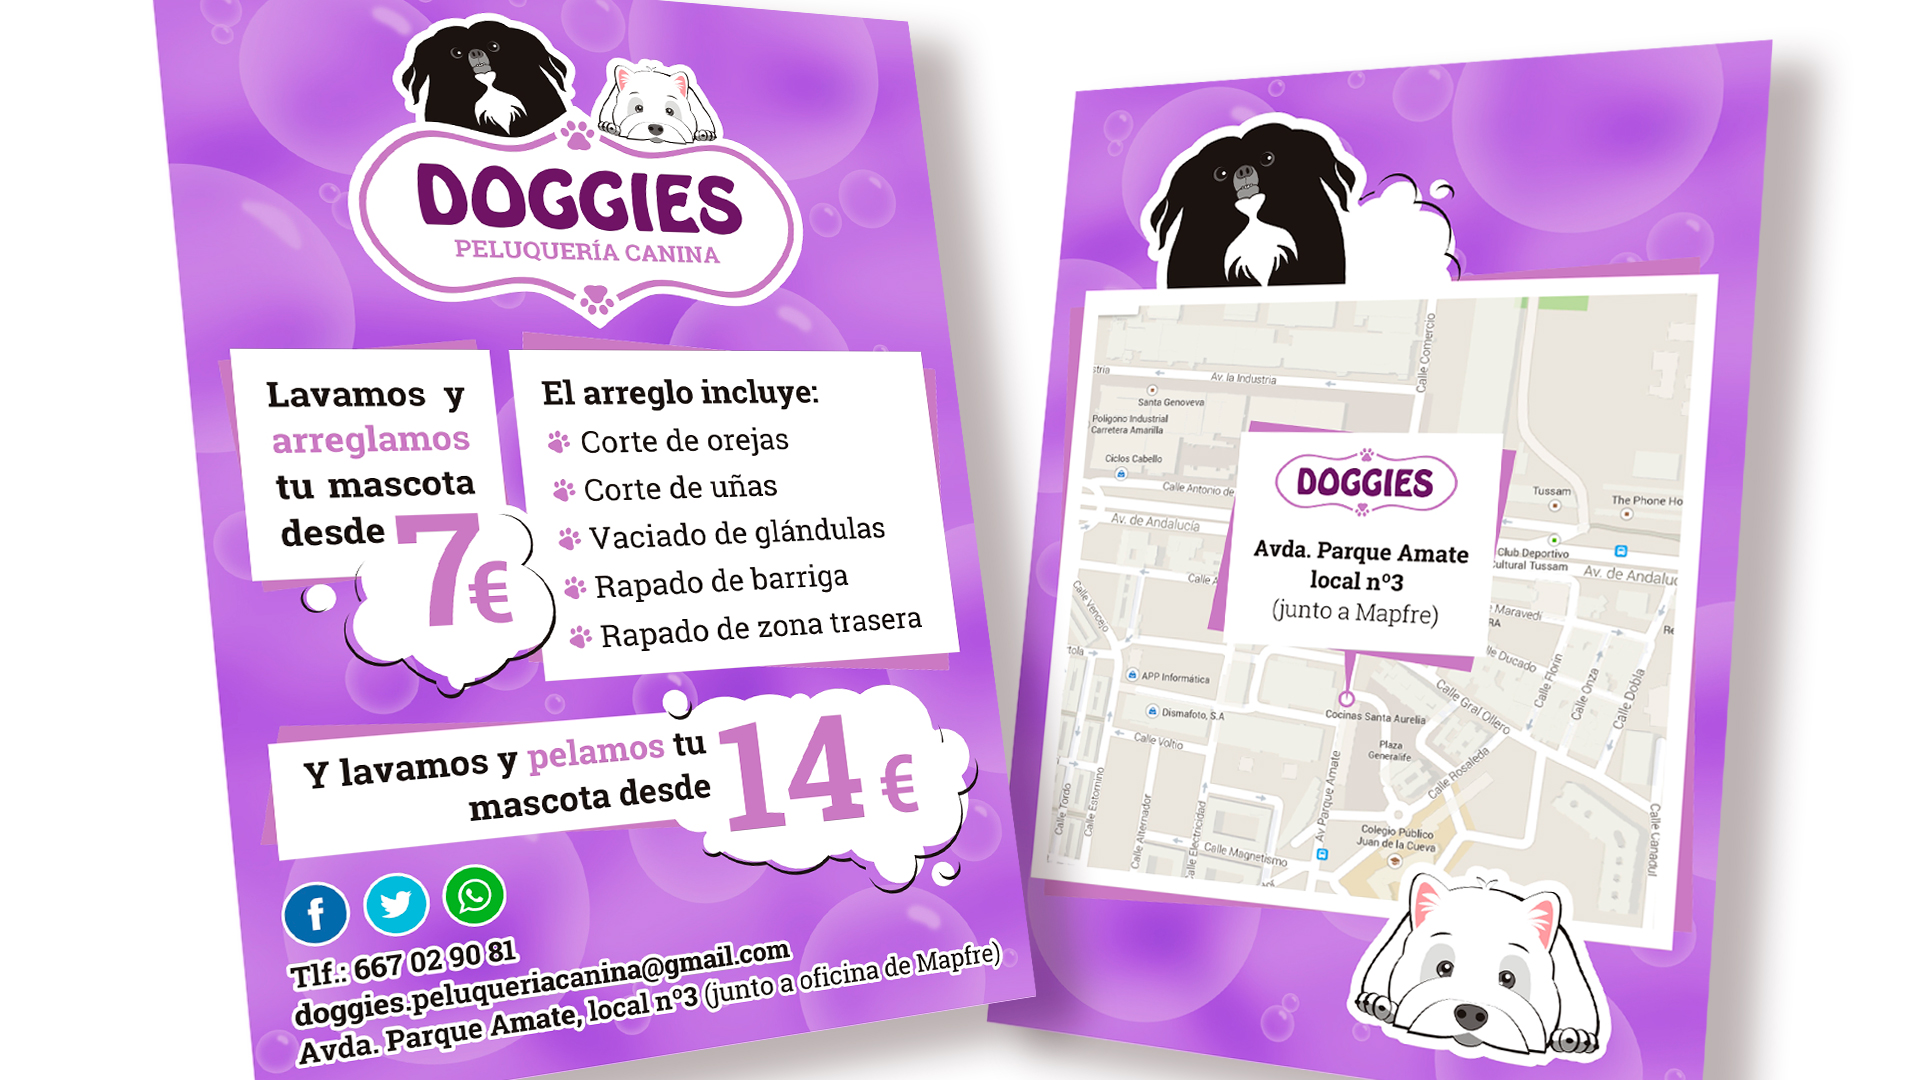 DOGGIES - Flyers